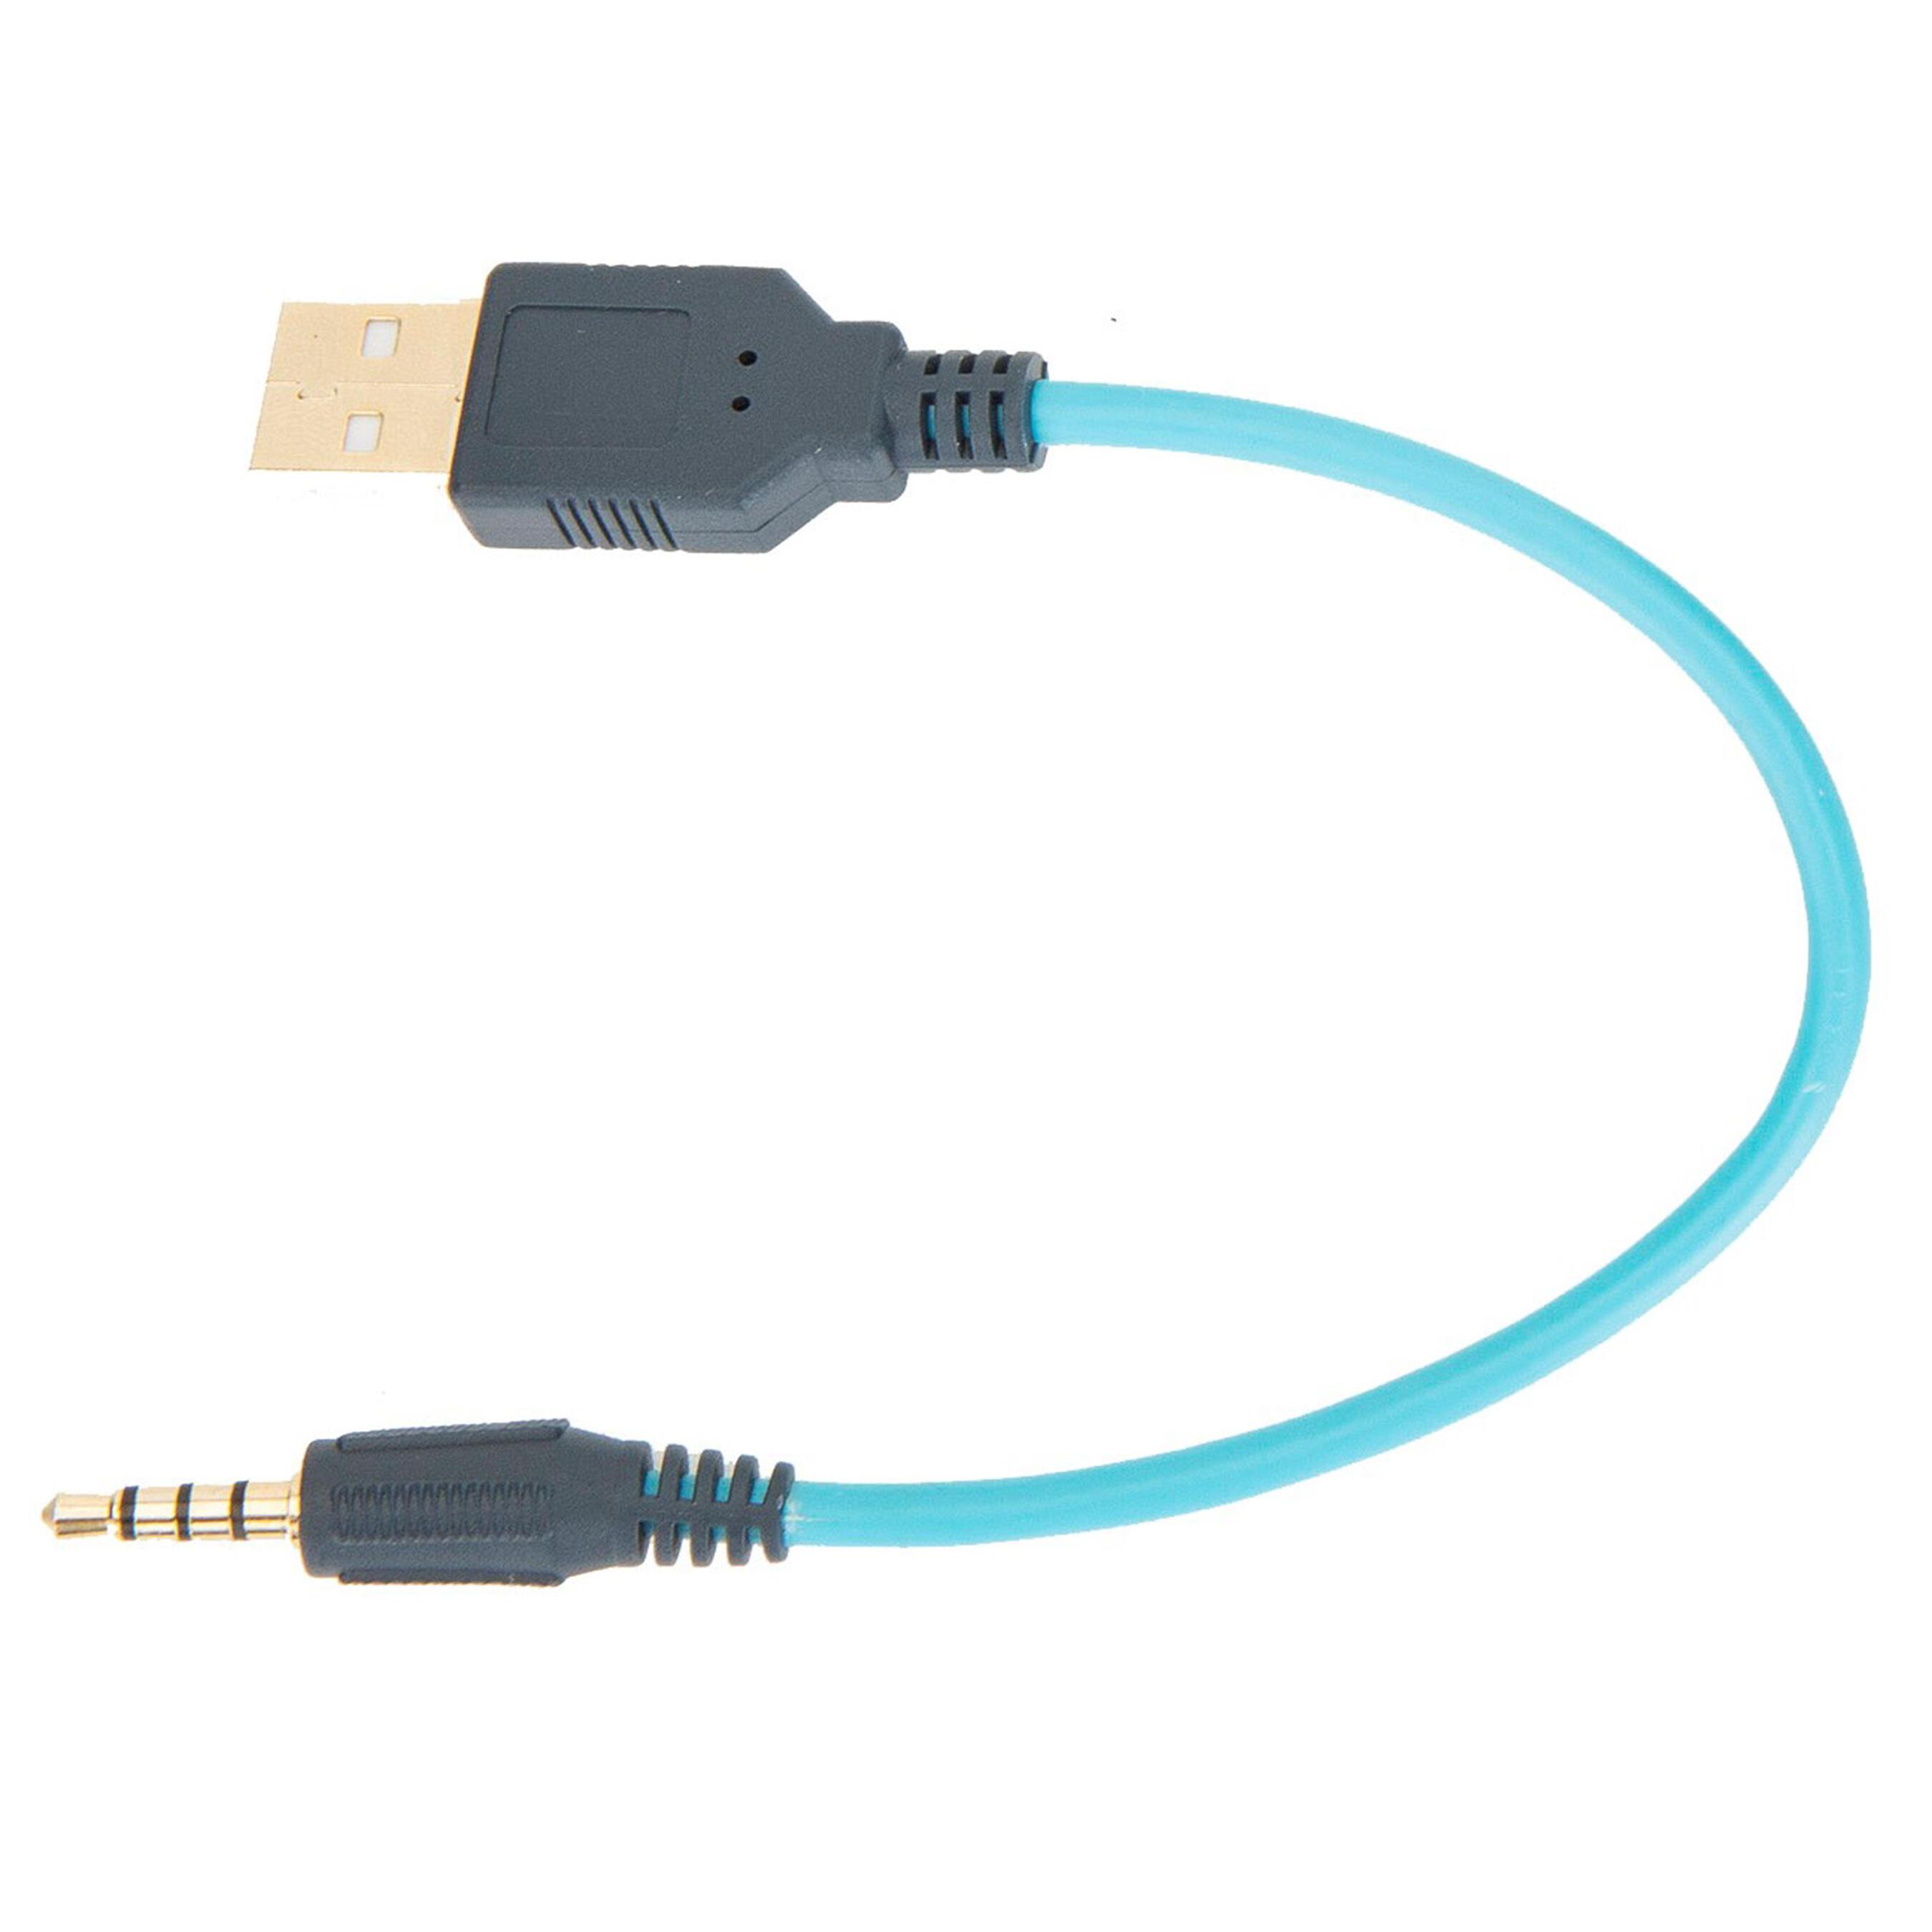 Cablu USB Swimmusic 100